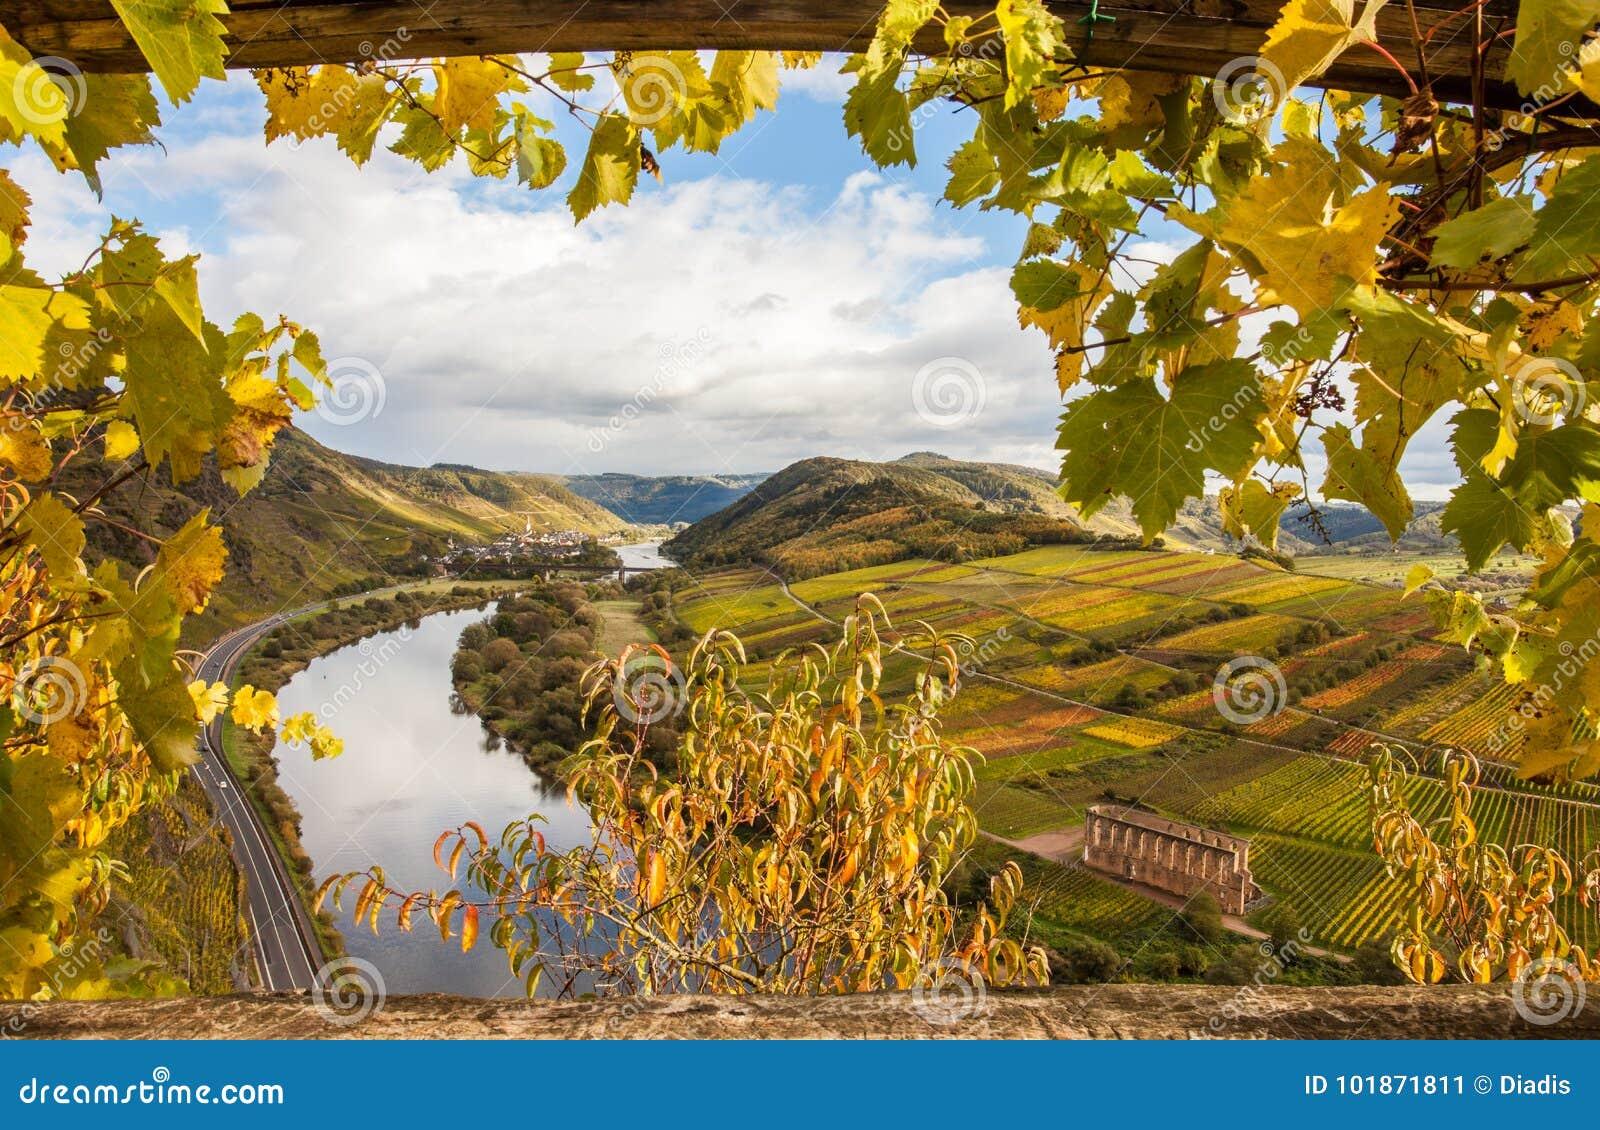 Klettersteig Germany : Moselle autumn golden vineyards landscape calmont region germany